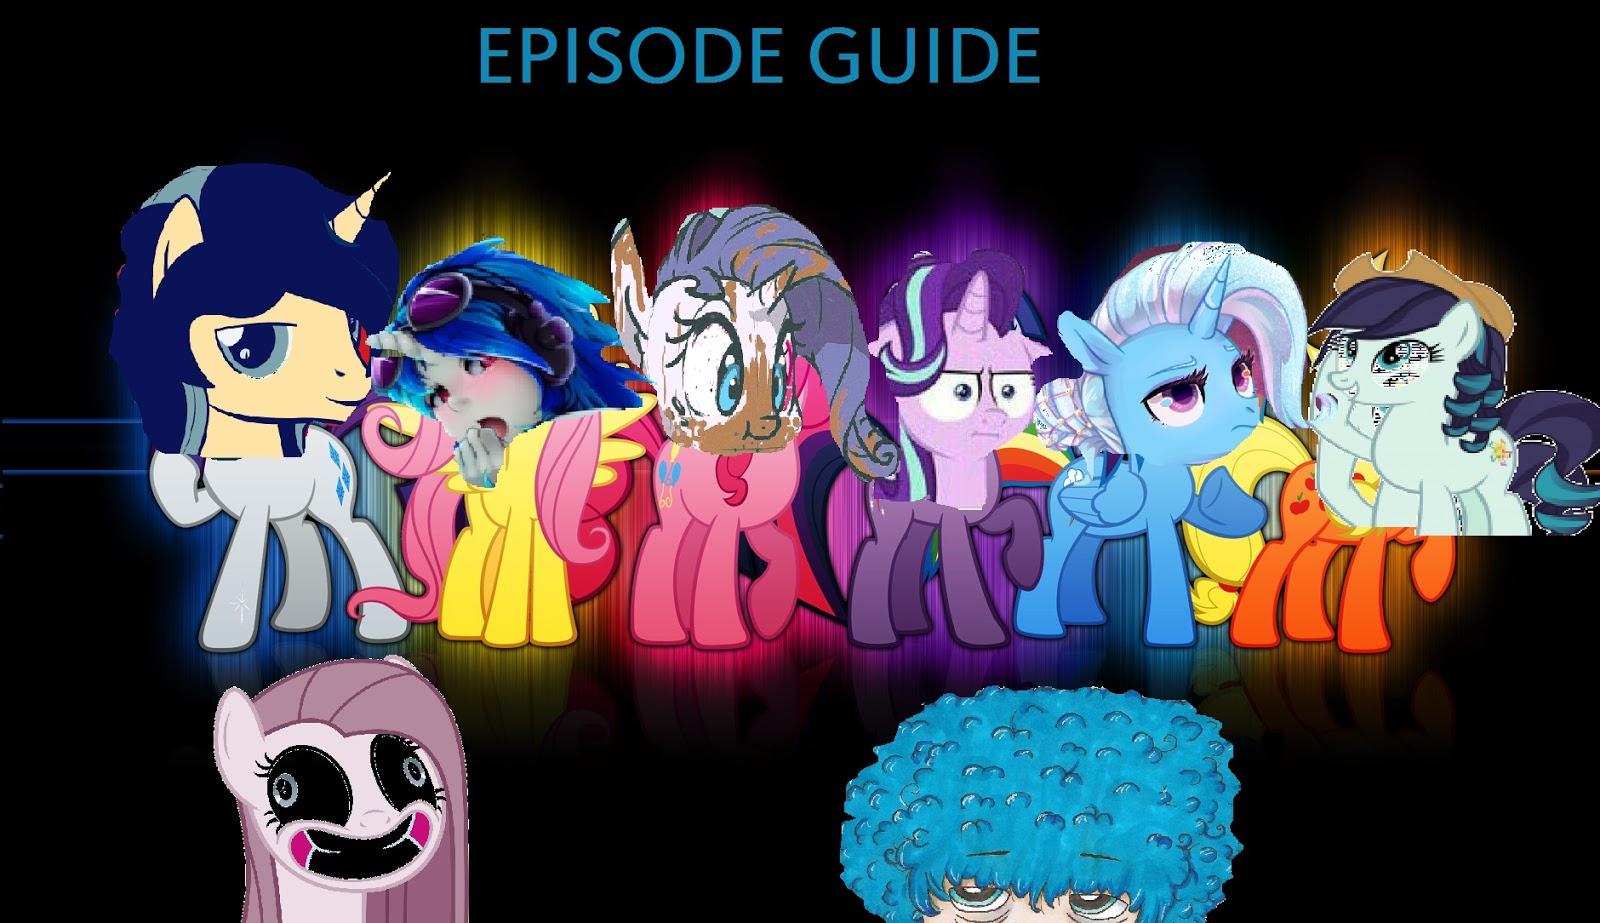 [Bild: little-pony-friendship-magic-cartoon-ful...esktop.jpg]